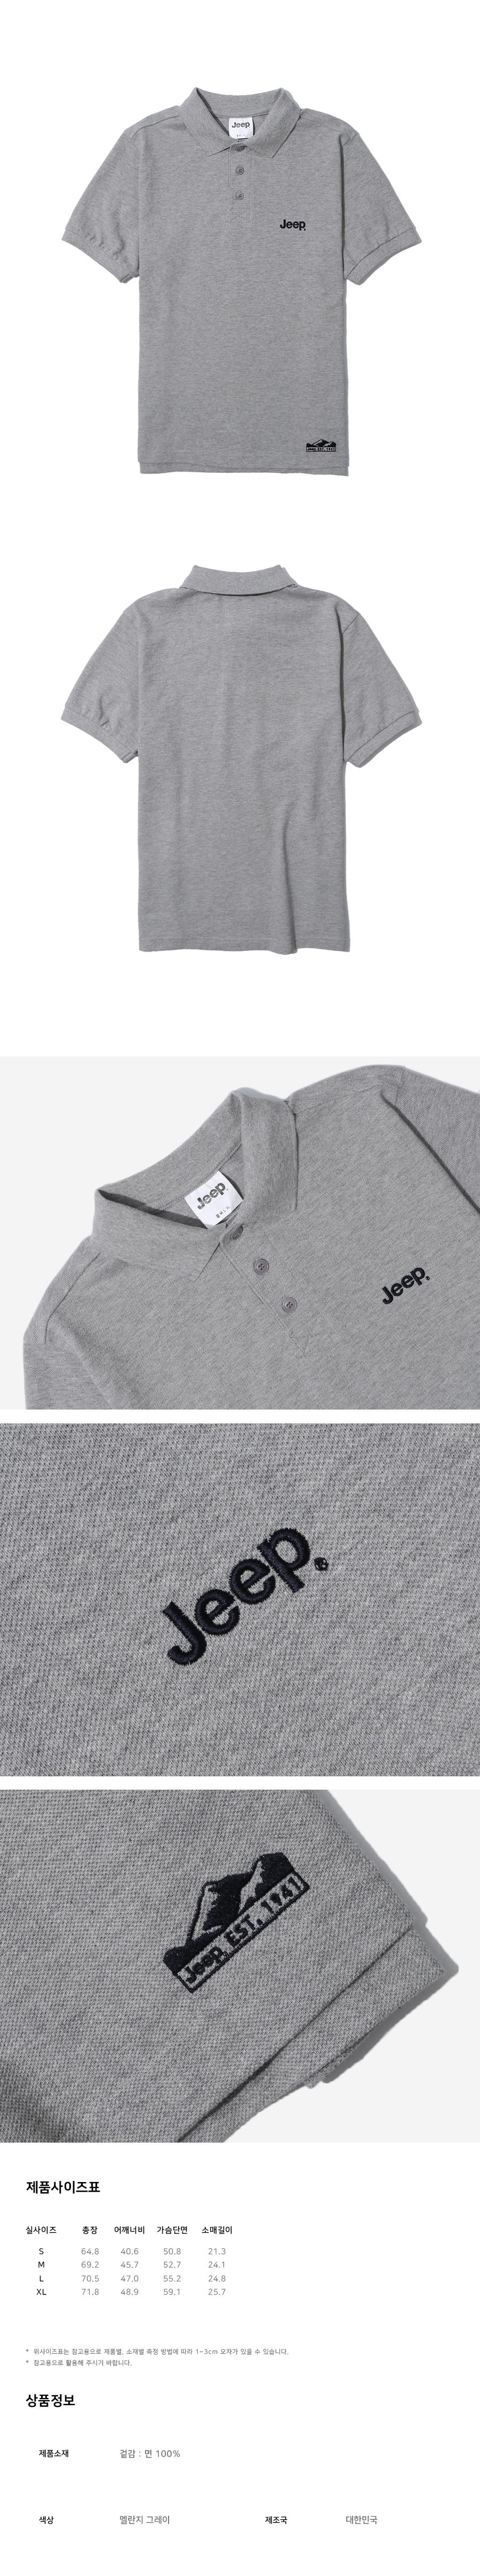 Overfit Pique Shirts (GL2TSU701MG)